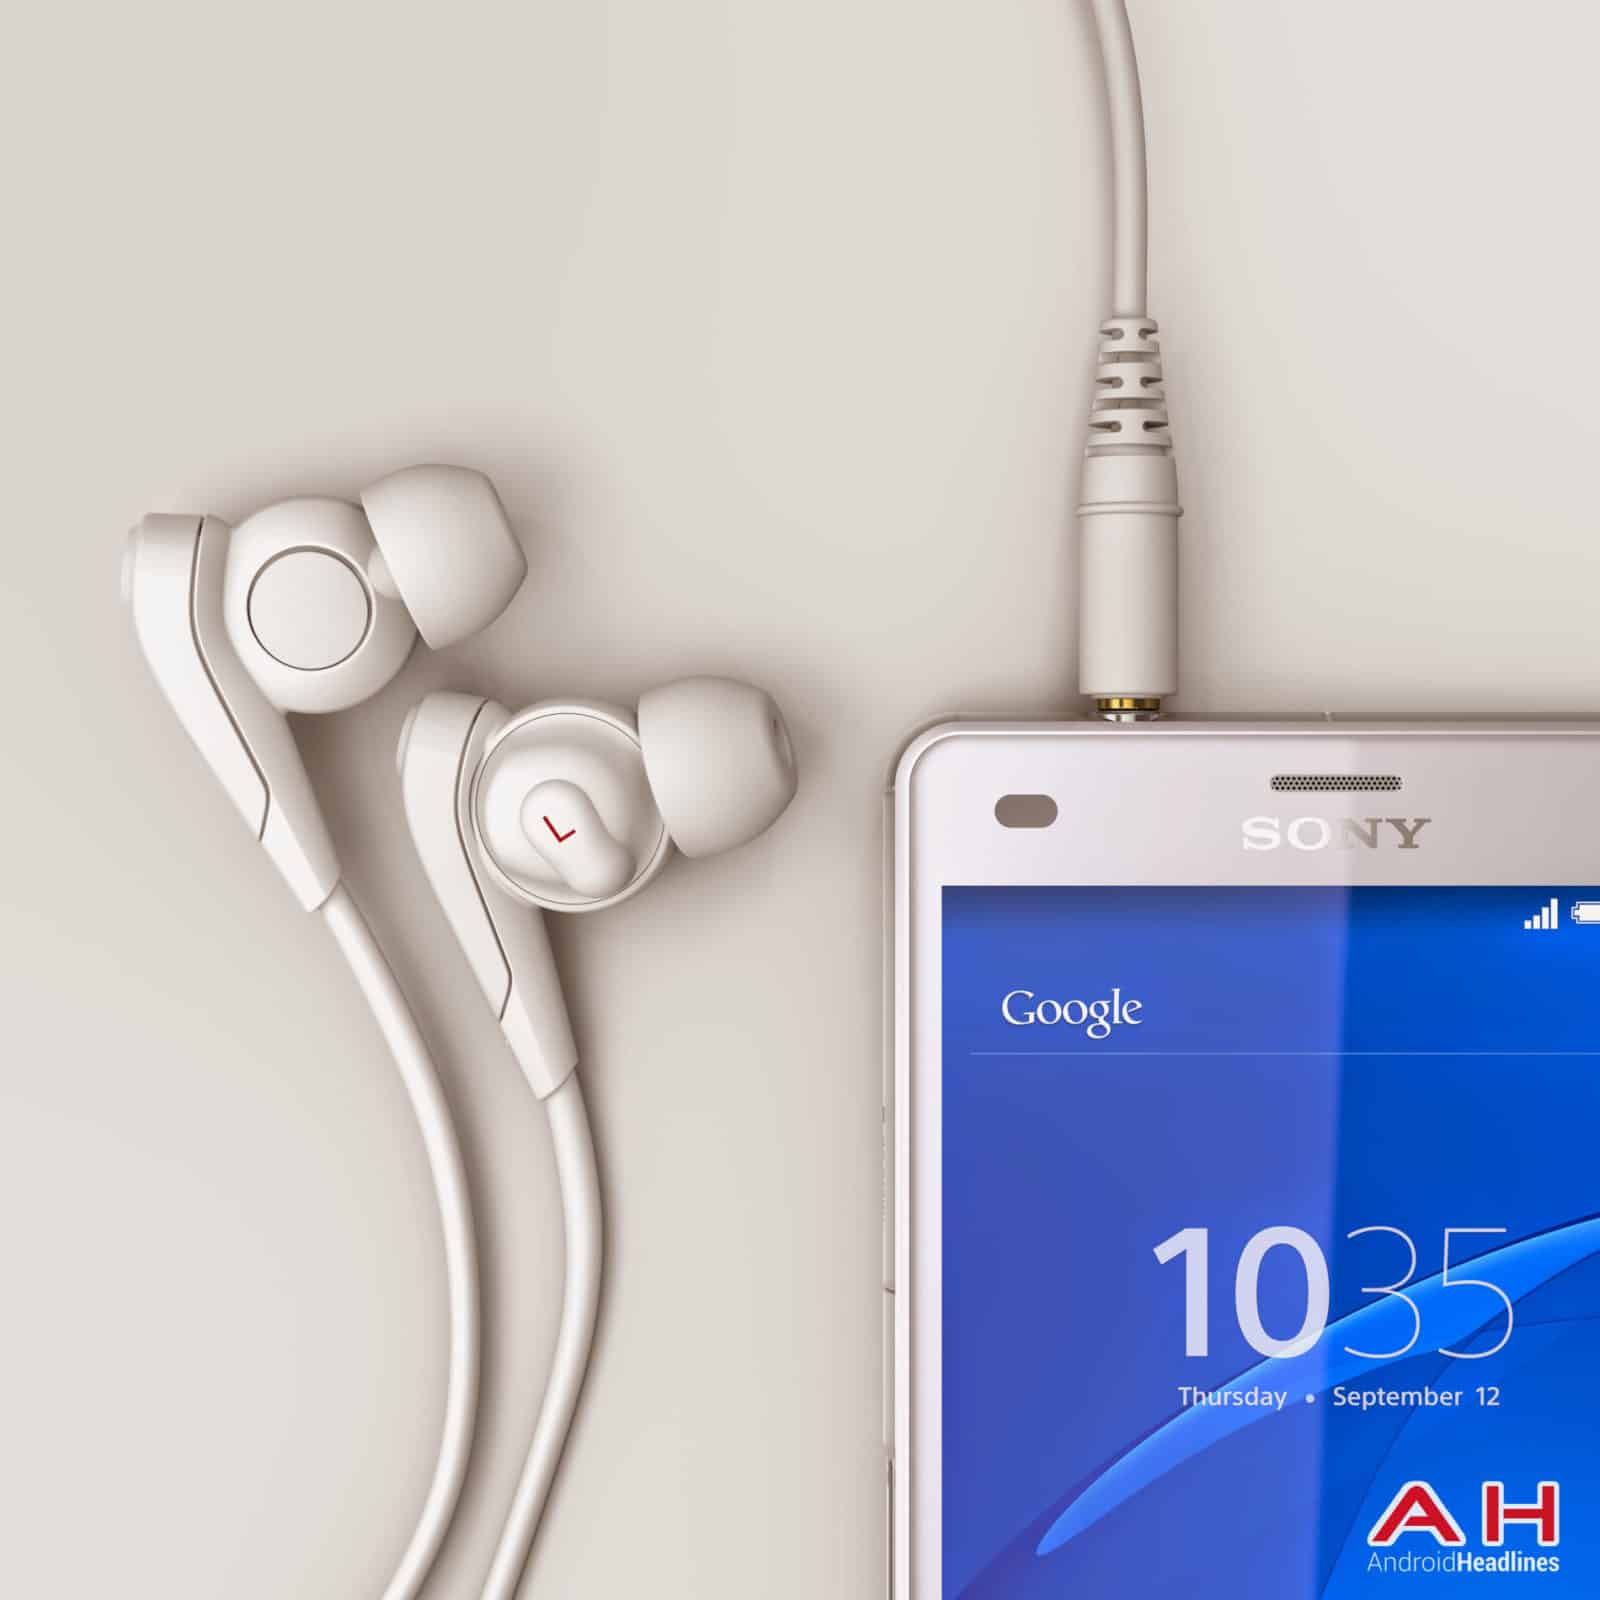 34_Xperia_Z3_Compact_Headphones